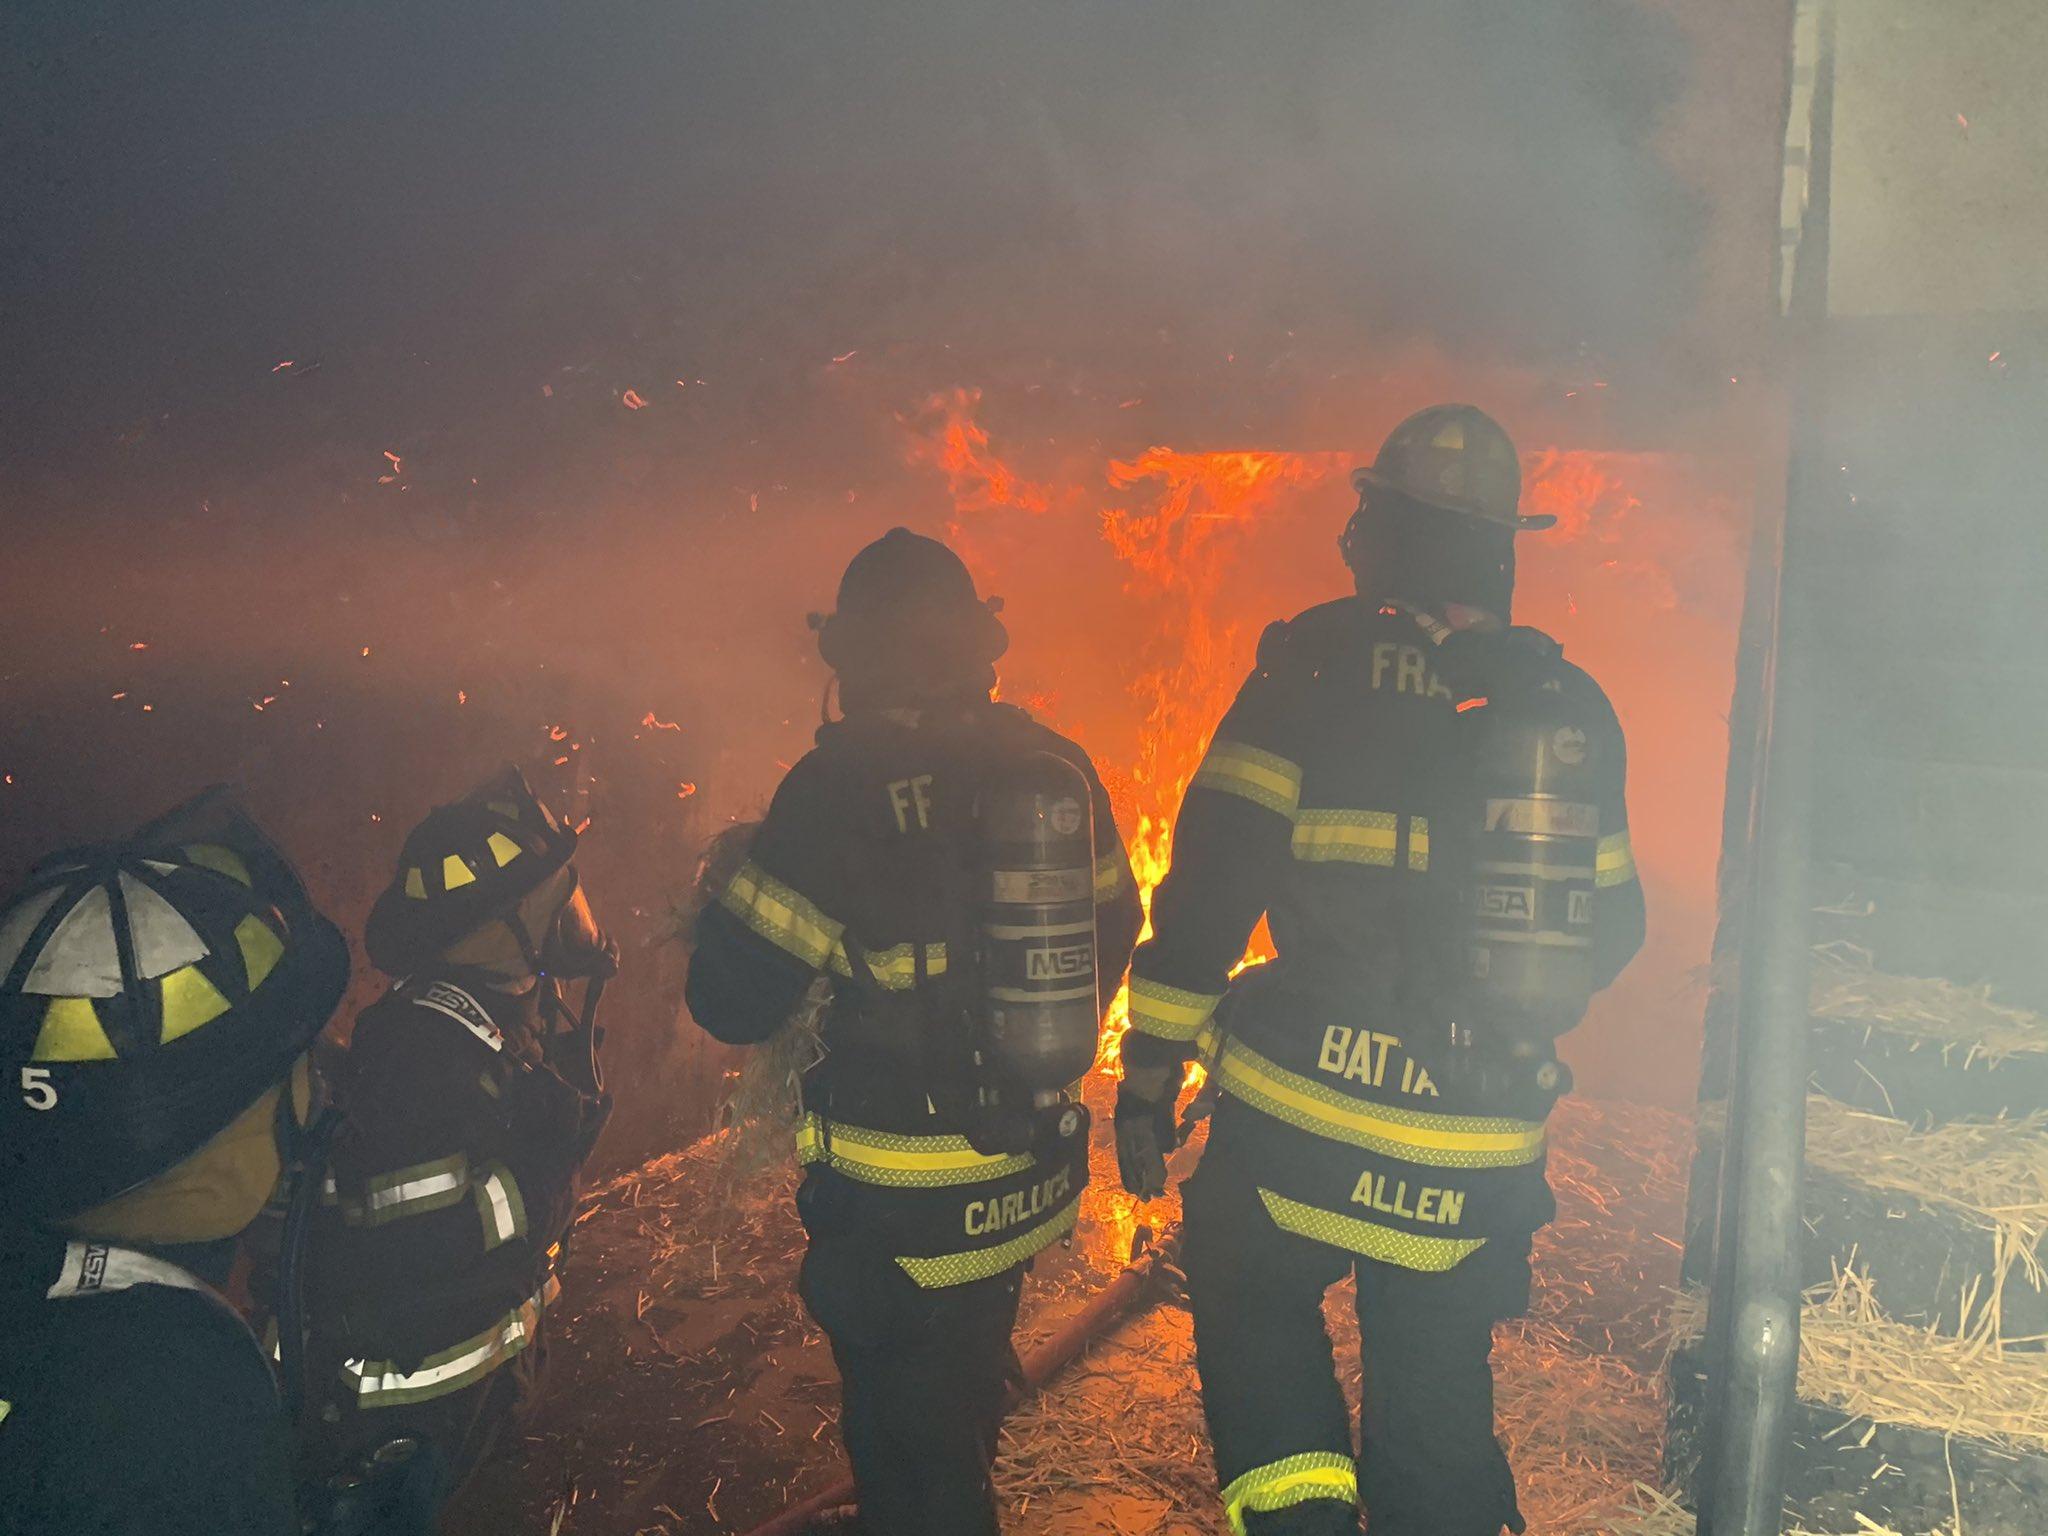 Live burn training